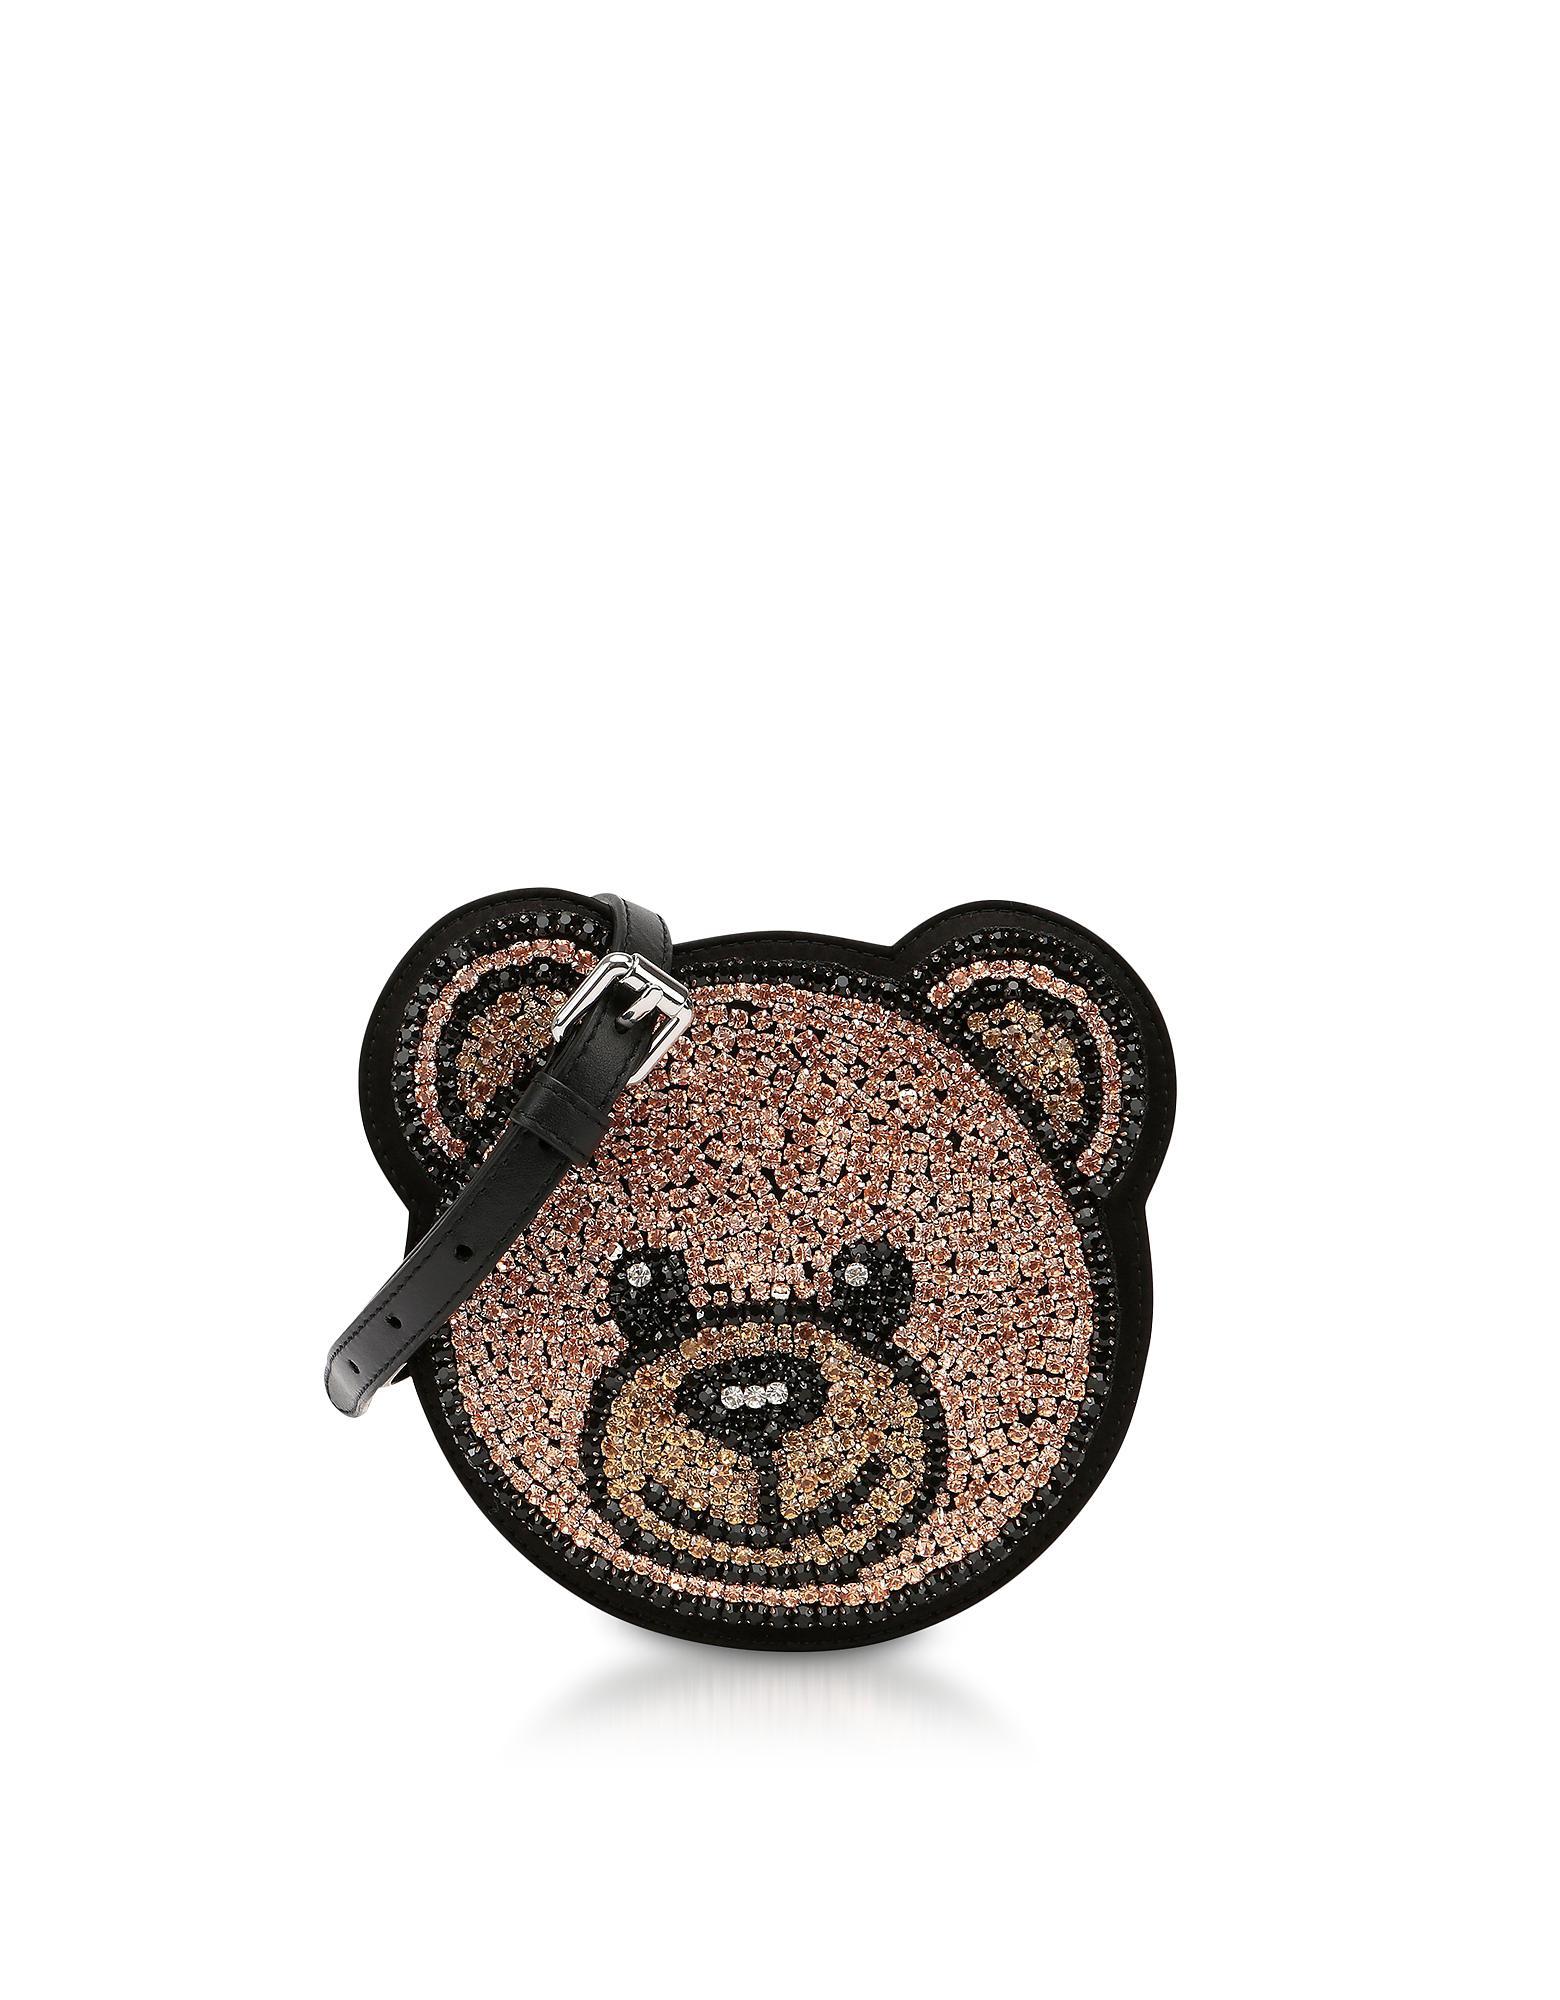 Brown Round Save 76923076923077 Moschino Bear Crossbody Teddy Bag Crystals 60 in Lyst w68ITq